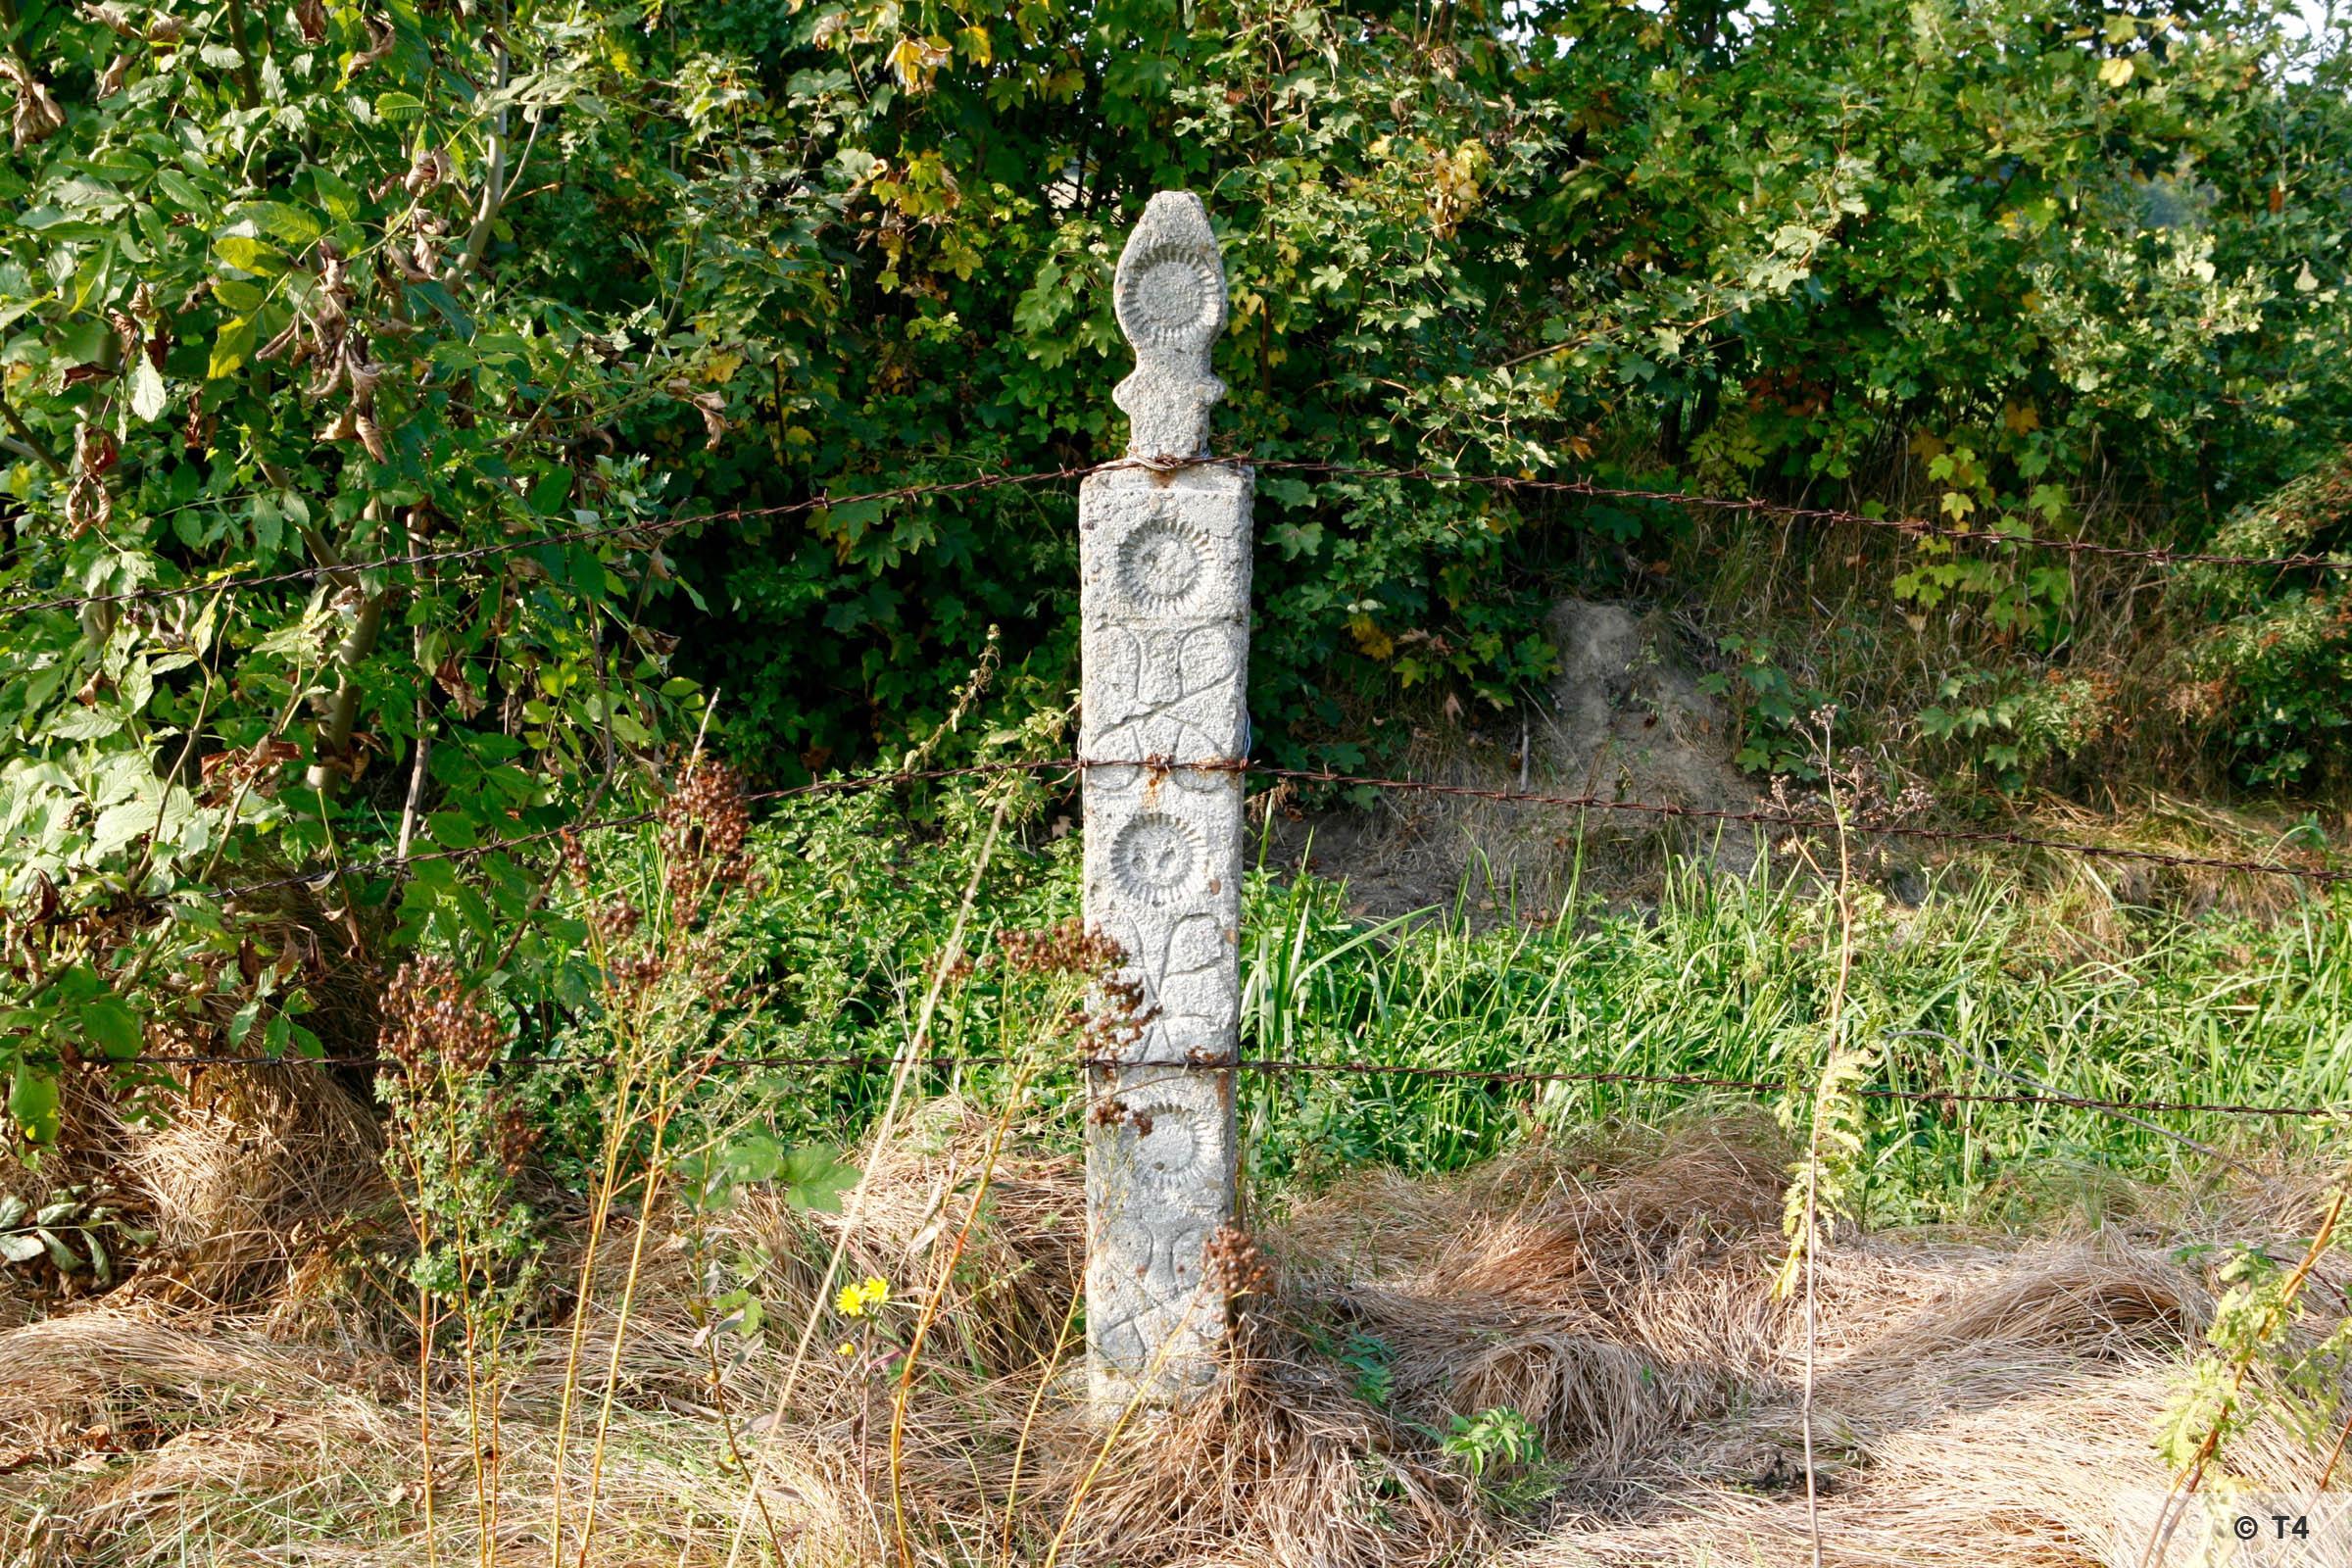 Ornamental fence post. 2006 T4 2412